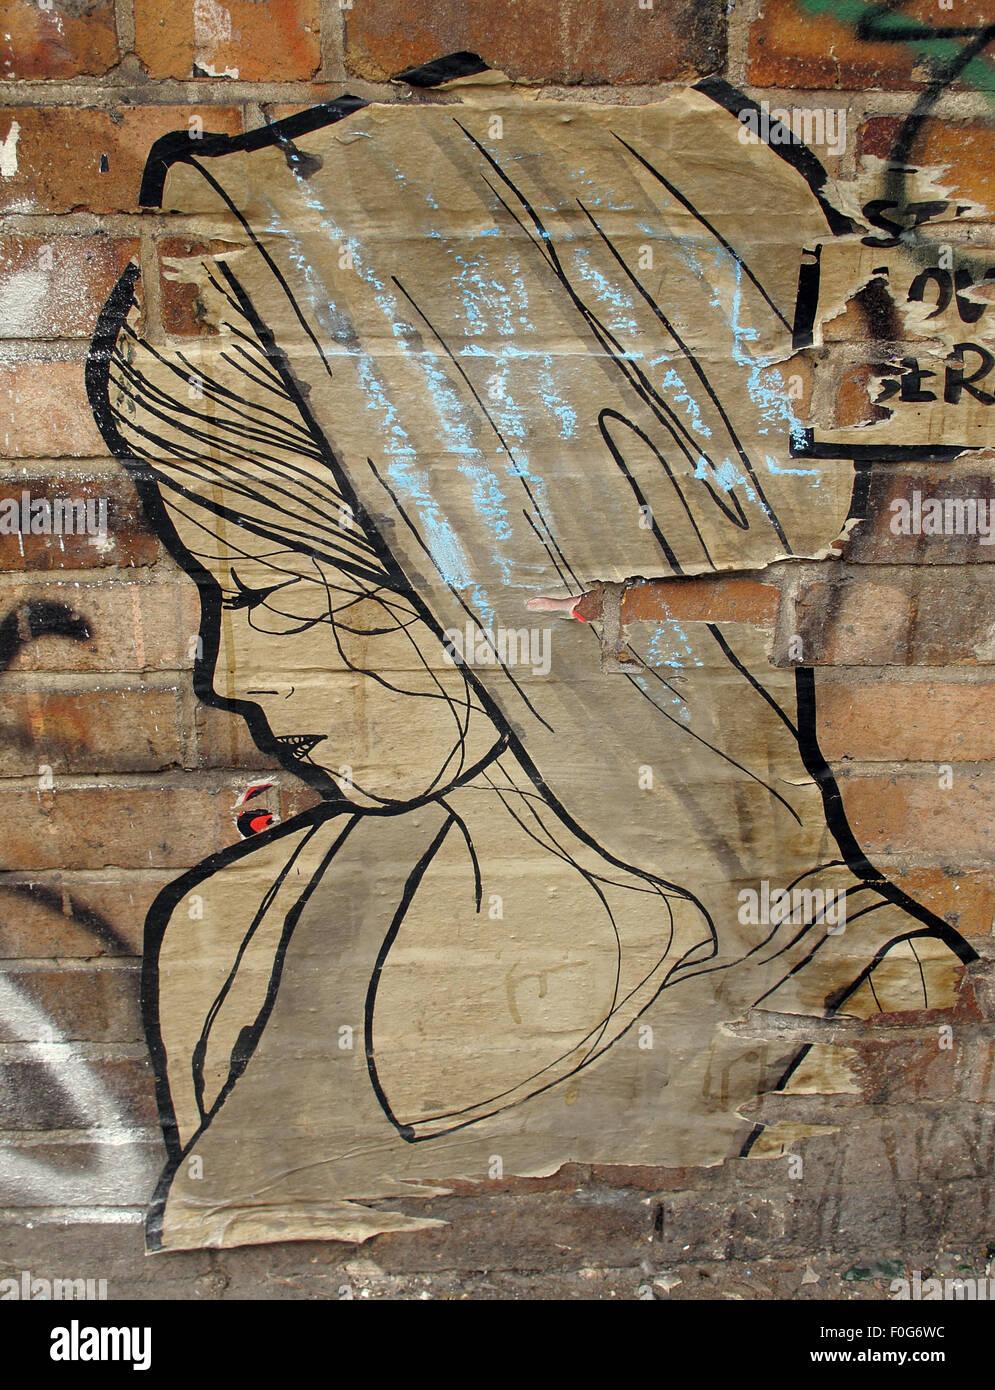 Mitte,DircksenStr,Berlin,Germany,streetArt,artist,of,the,streetsmixedmedia,mixed,media,poster,paper,wall,walls,city,cities,urban,hipster,controversial,paste,up,pasteup,Girl,in,a,shawl,GoTonySmith,Deutsche,Deutschland,Buy Pictures of,Buy Images Of